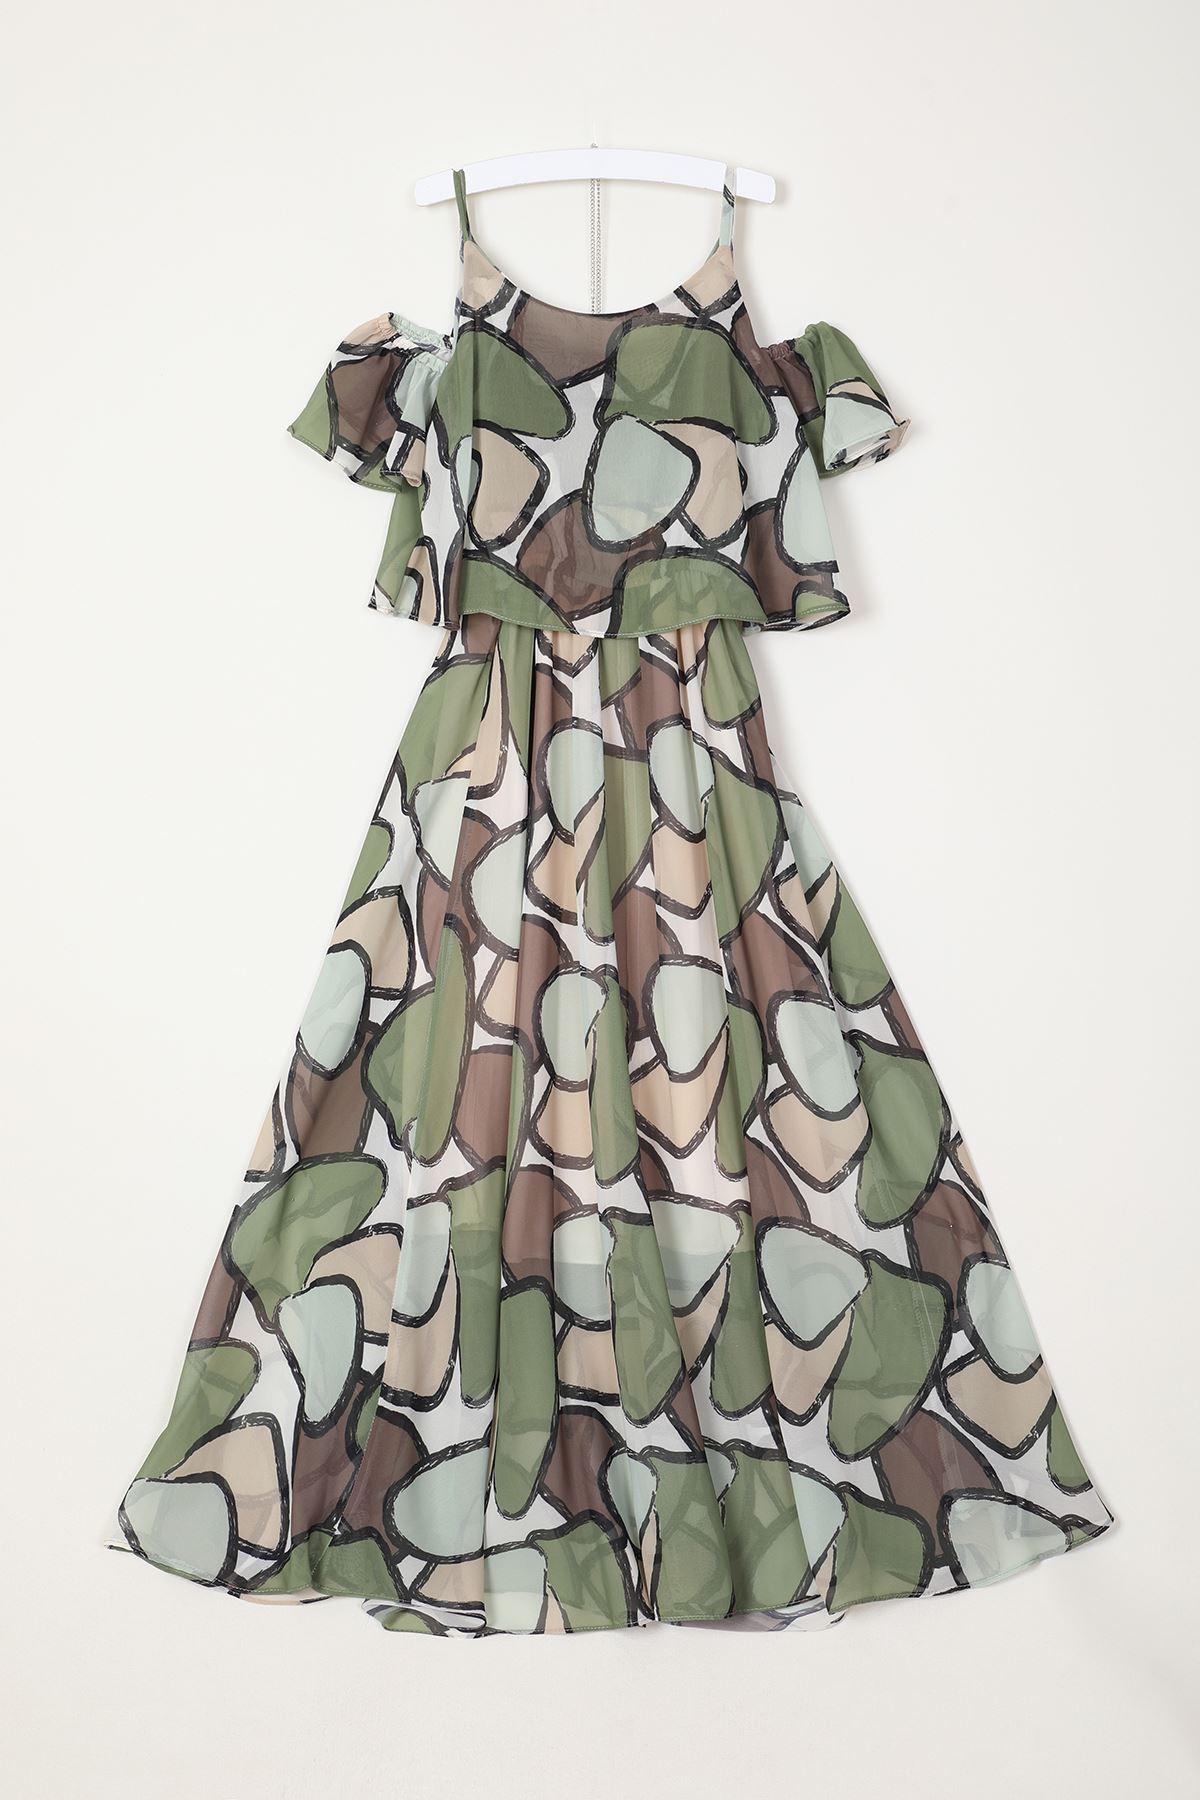 Omuz Pencereli Şifon Elbise